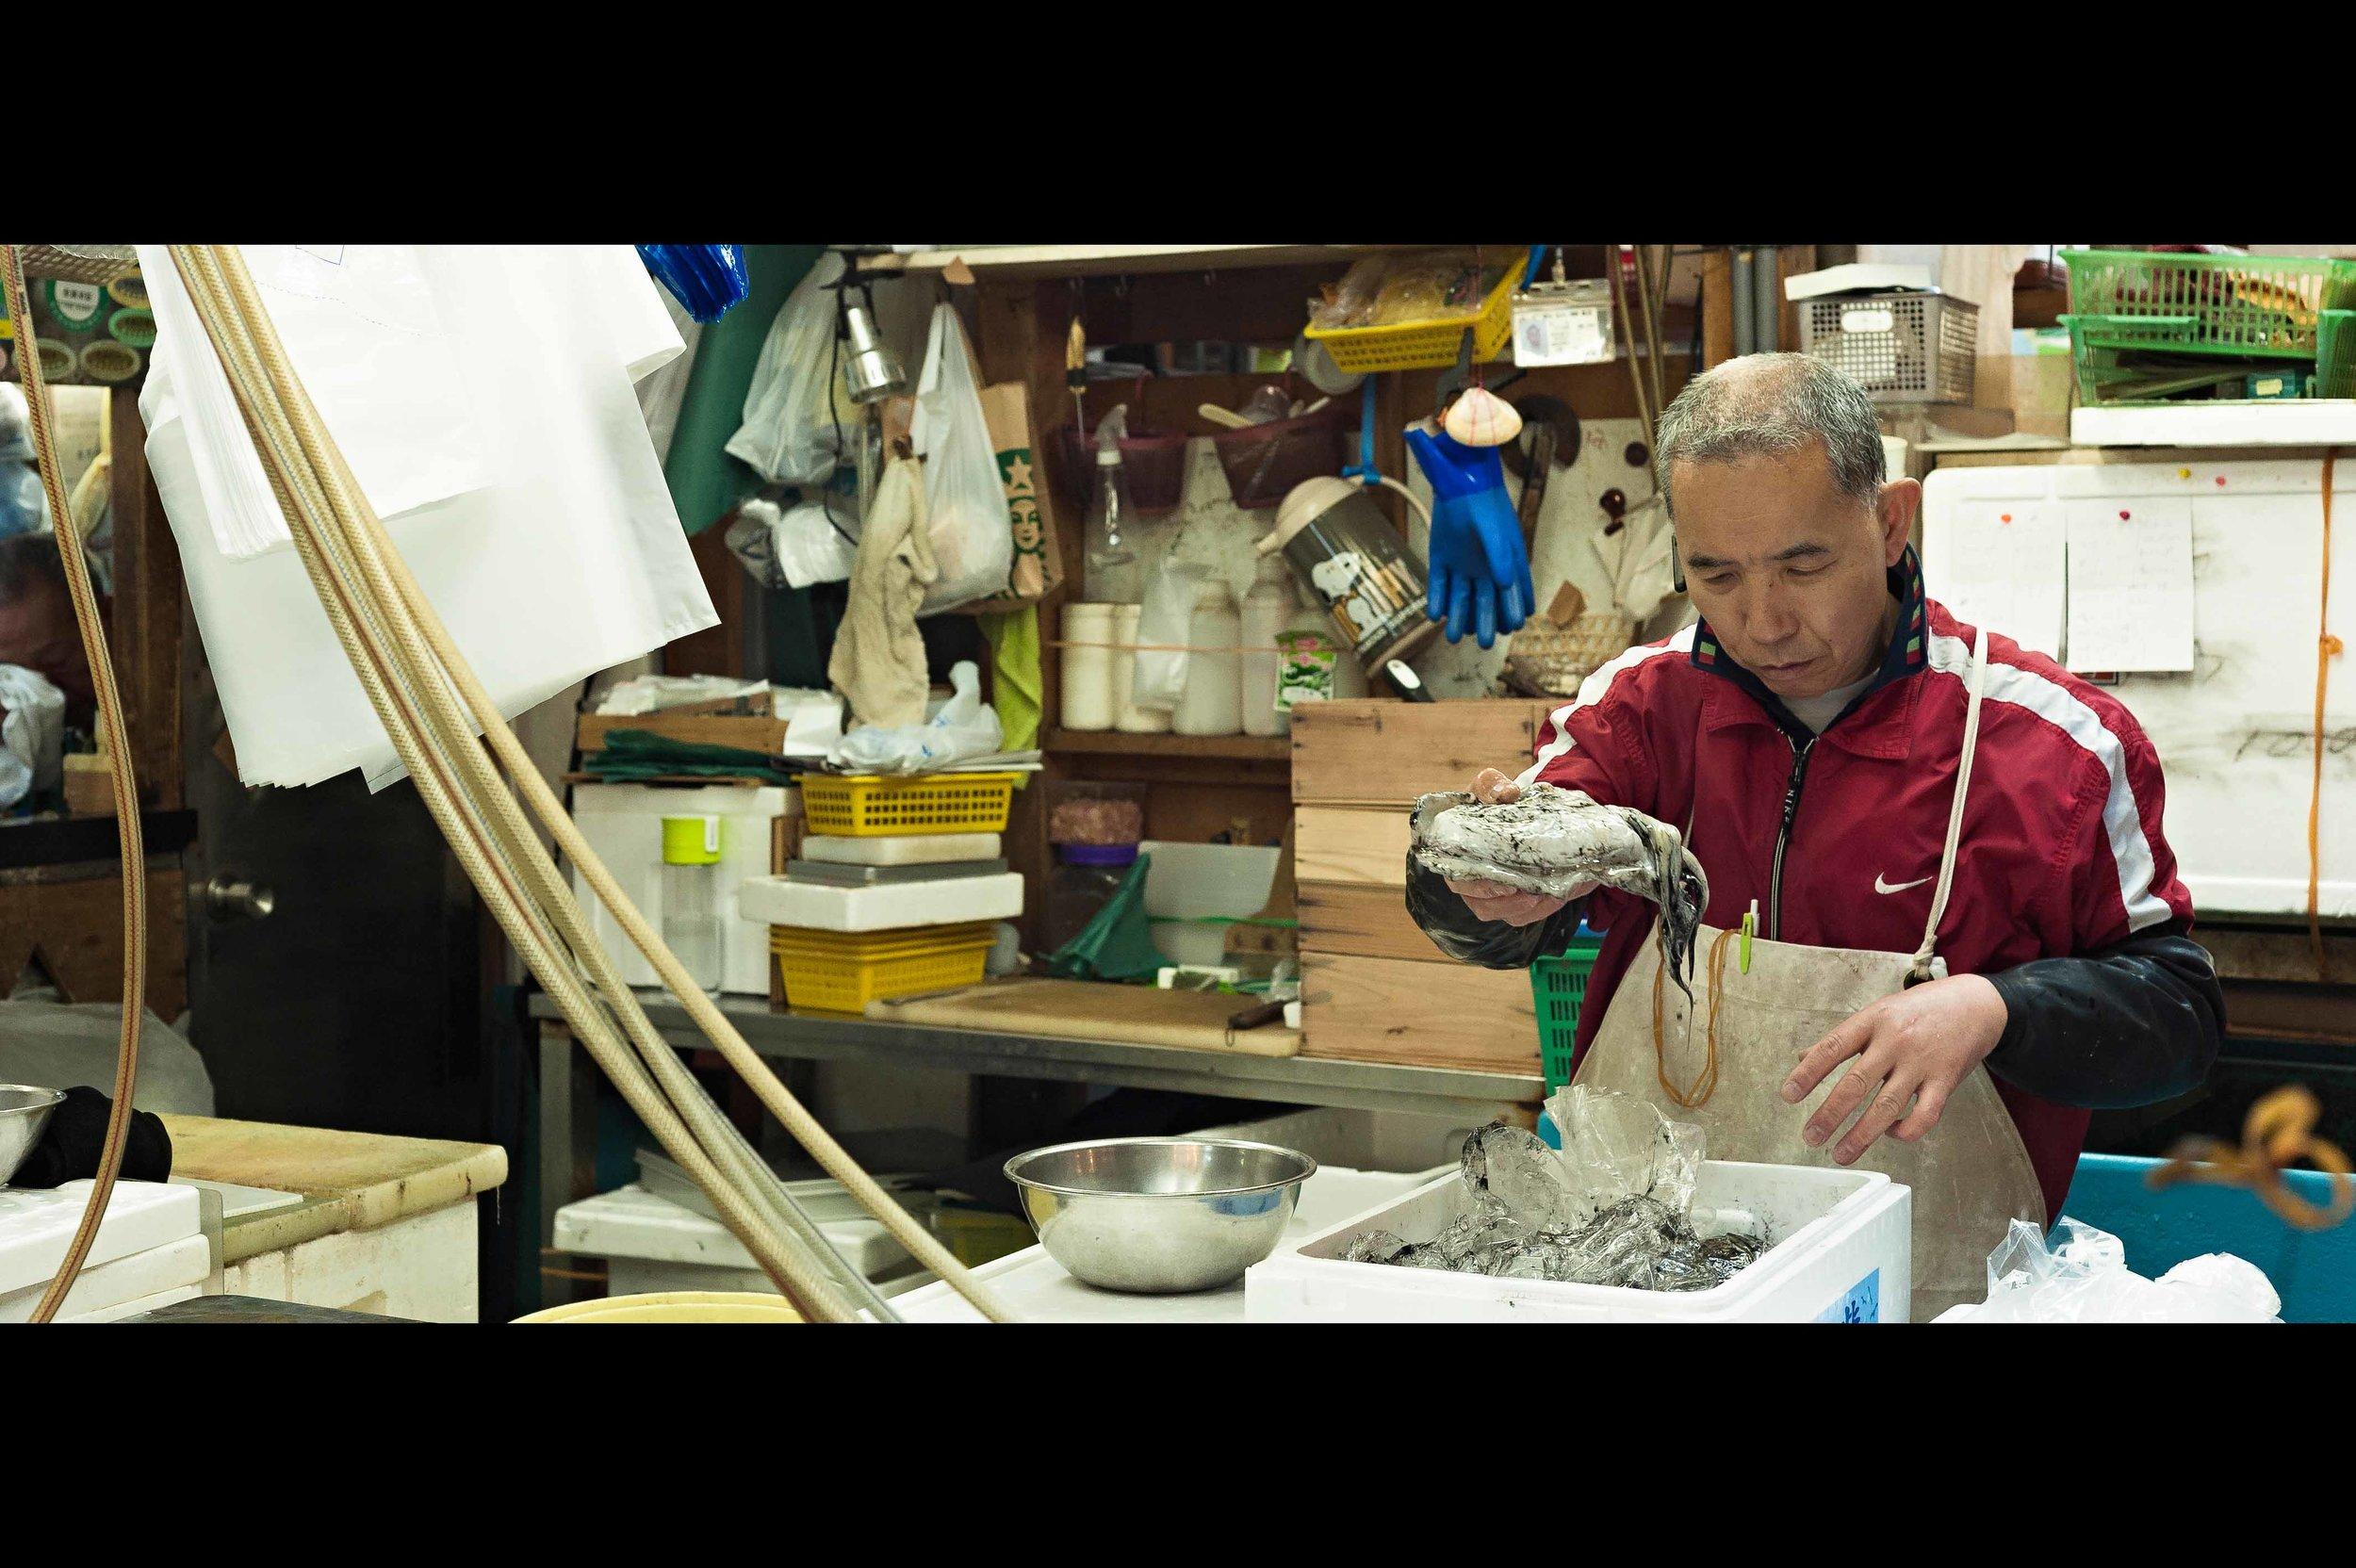 cuttlefish-fish-market-vendor-tsukiji copy.jpg